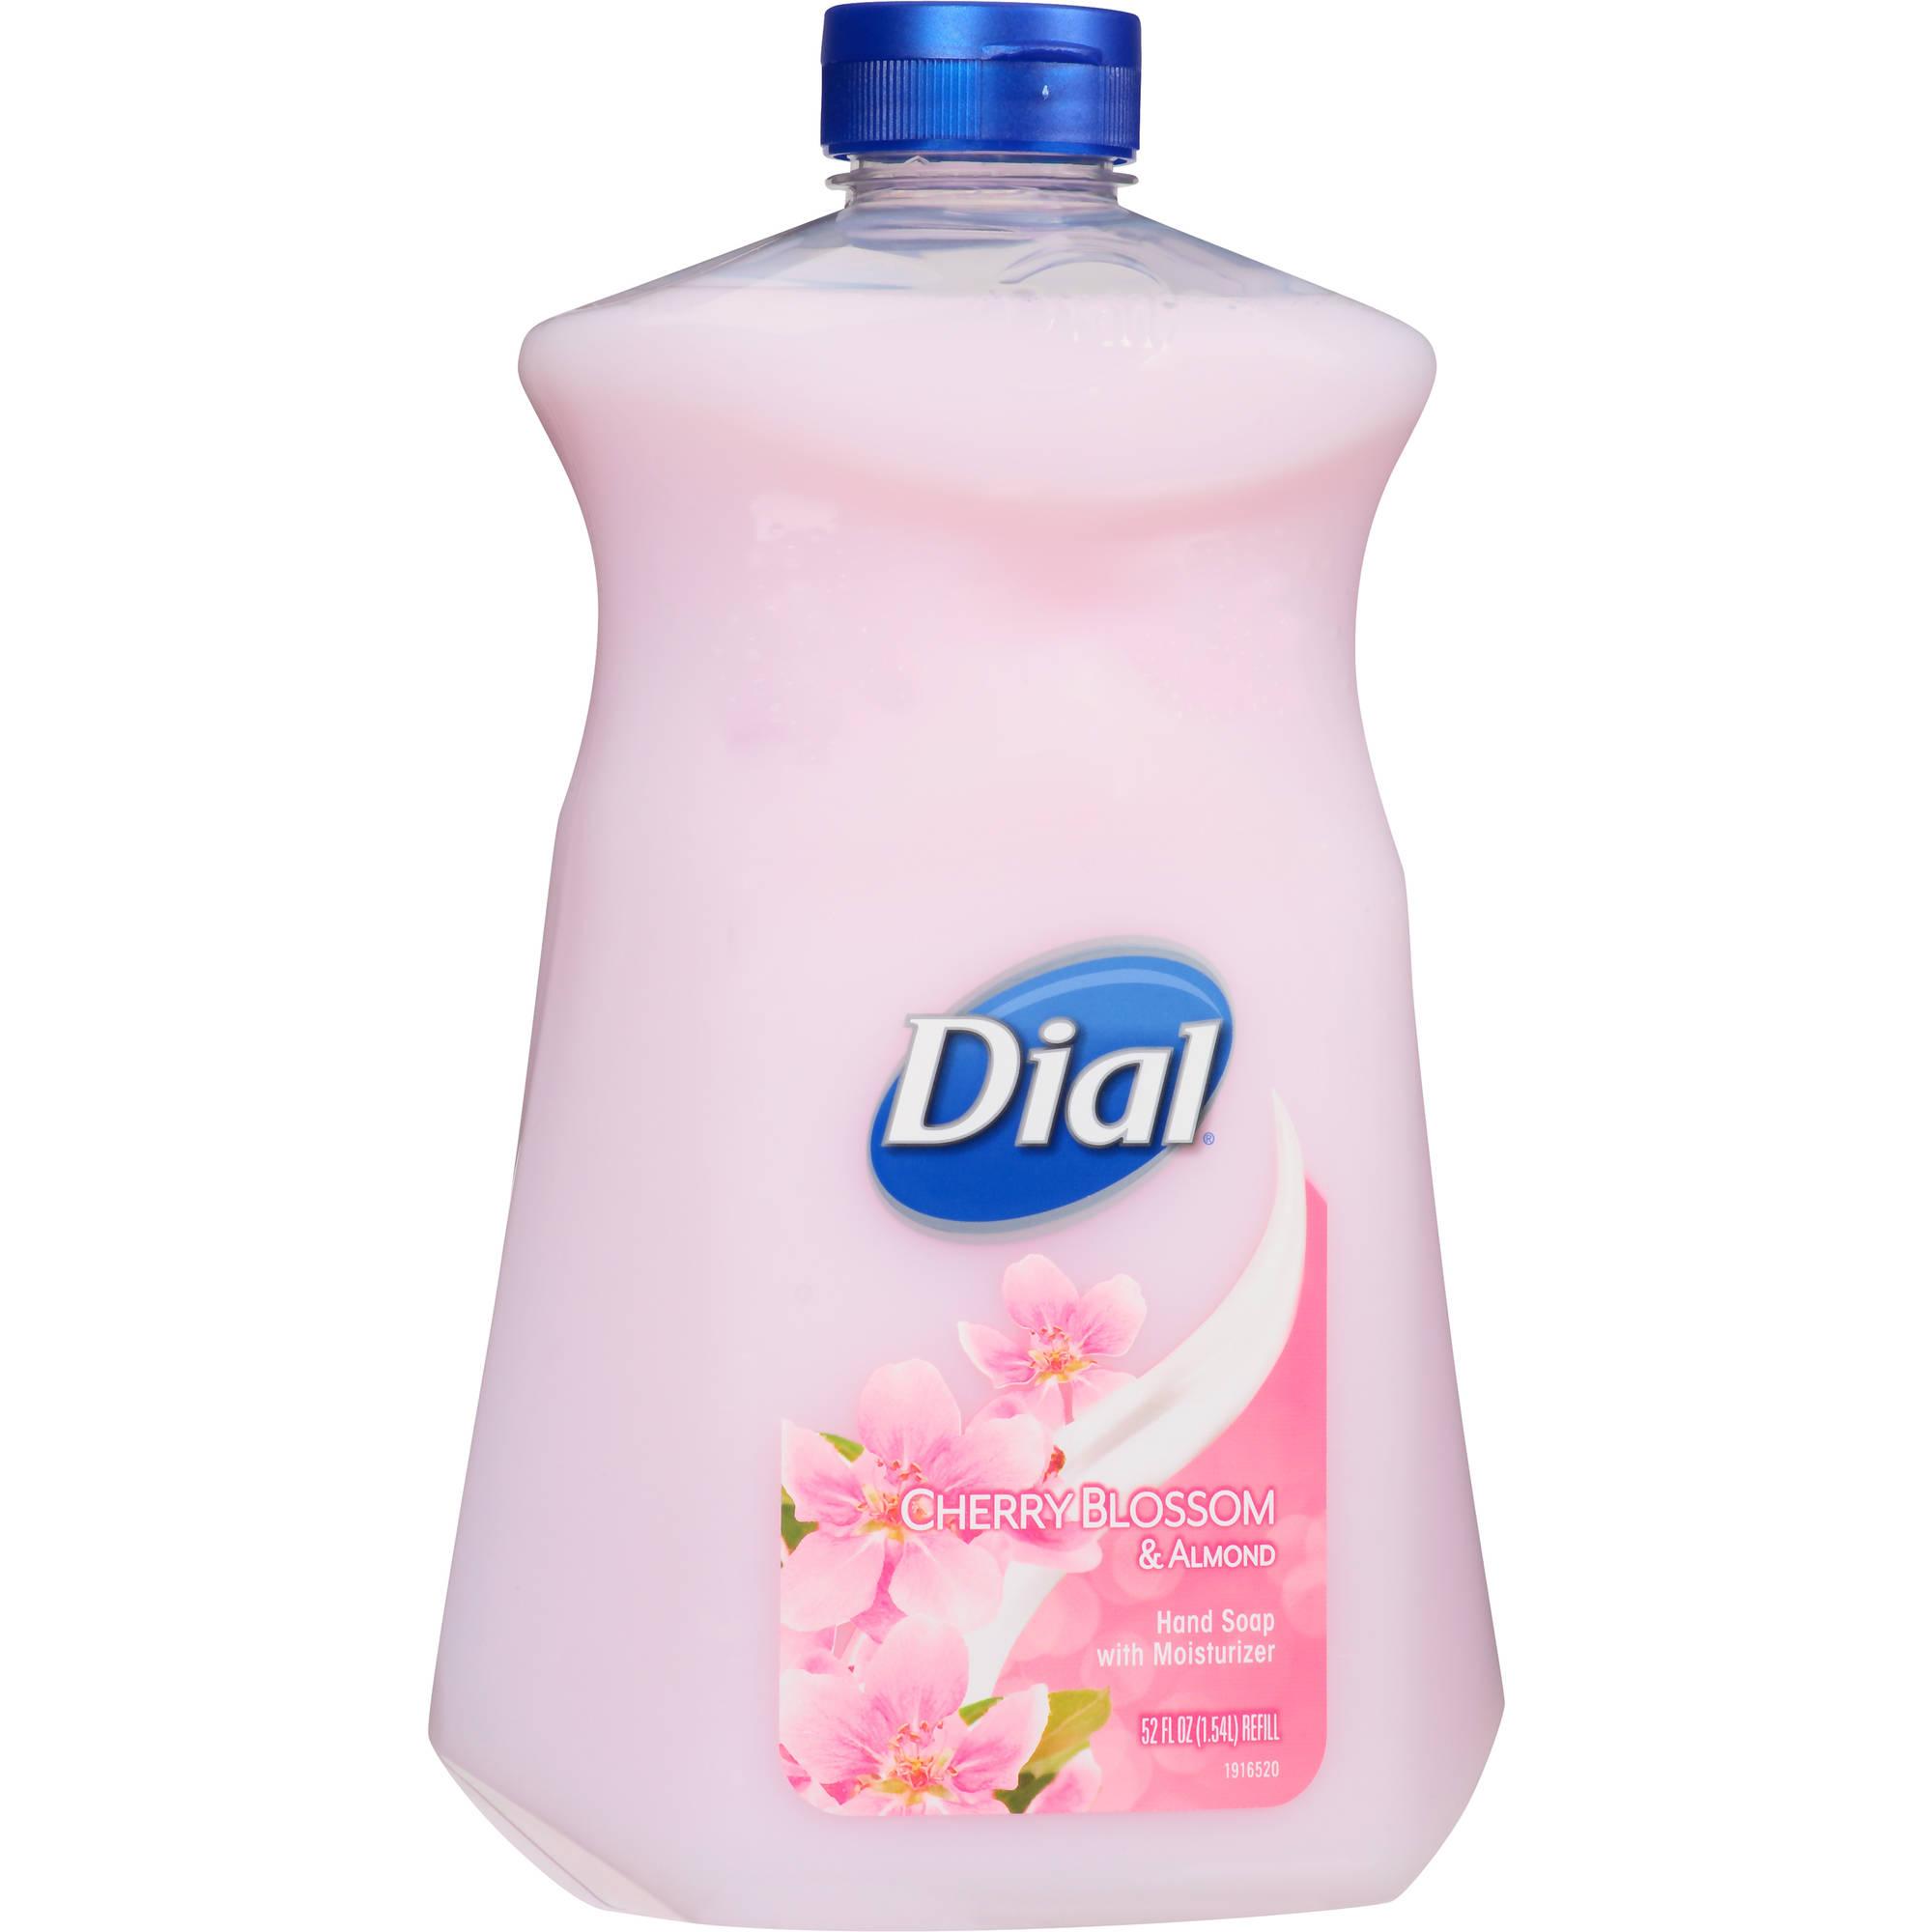 Dial Cherry Blossom & Almond Refill Hand Soap, 52 oz